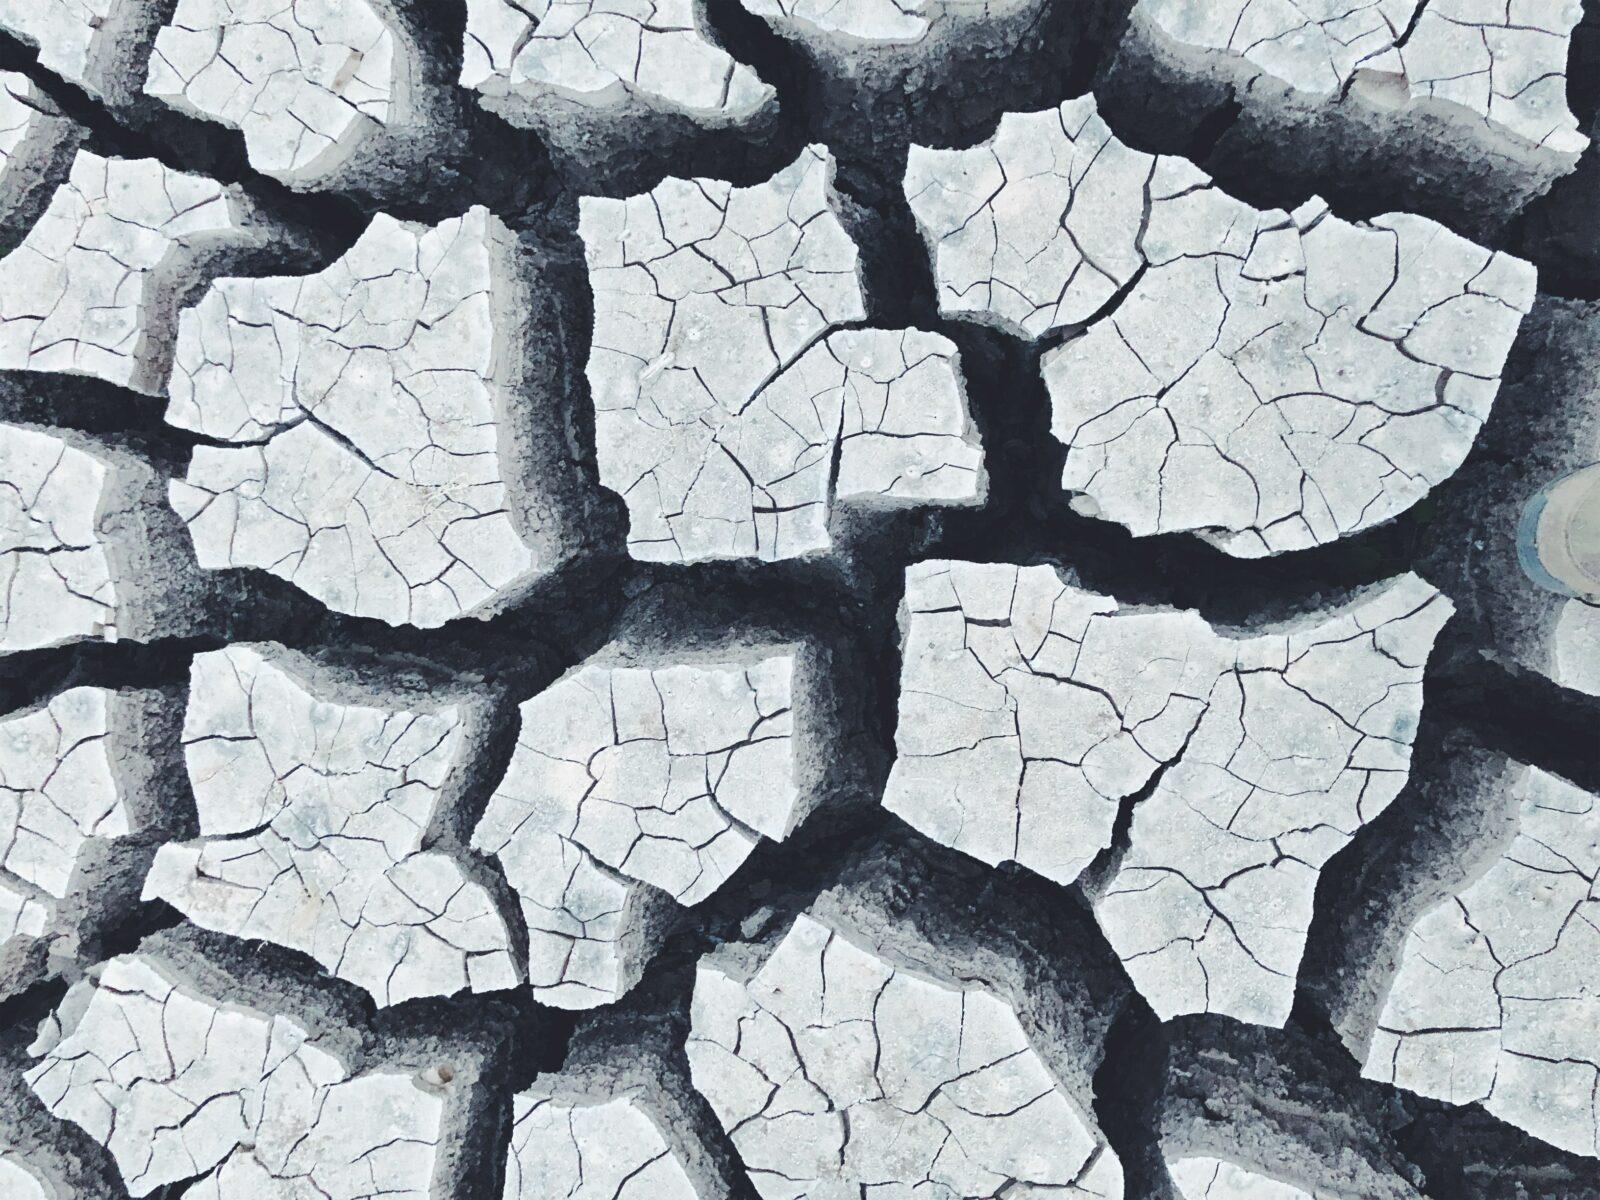 Cracked, uneven ground